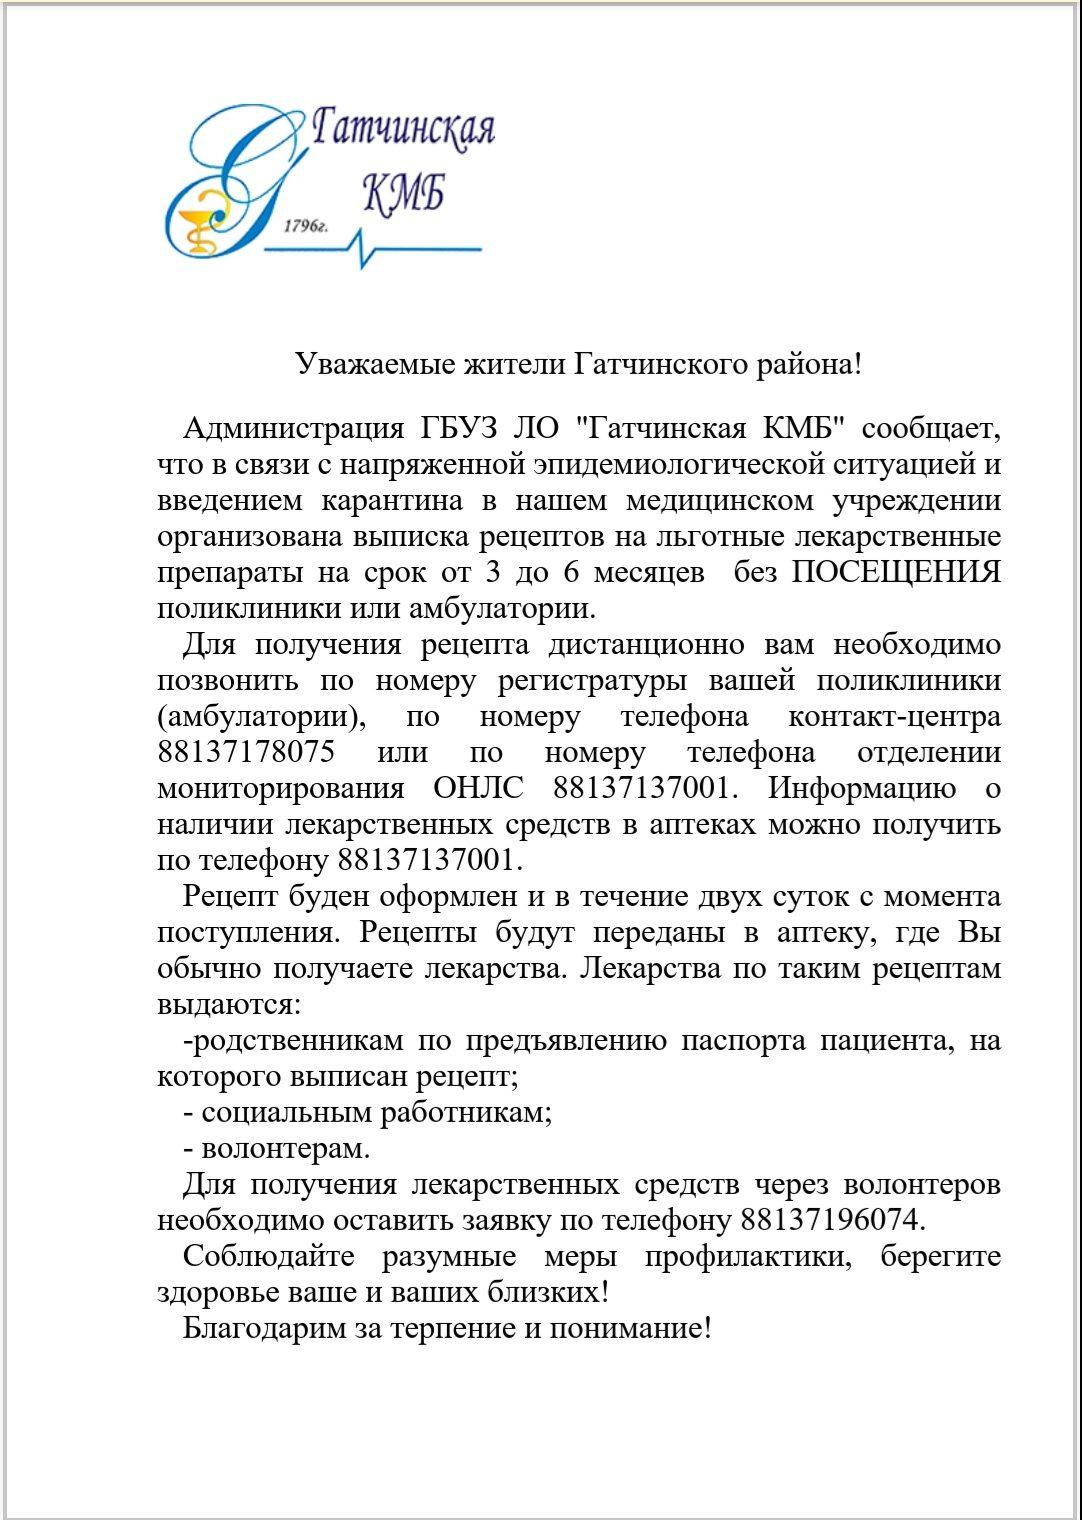 Screenshot_20200401-222225_Word